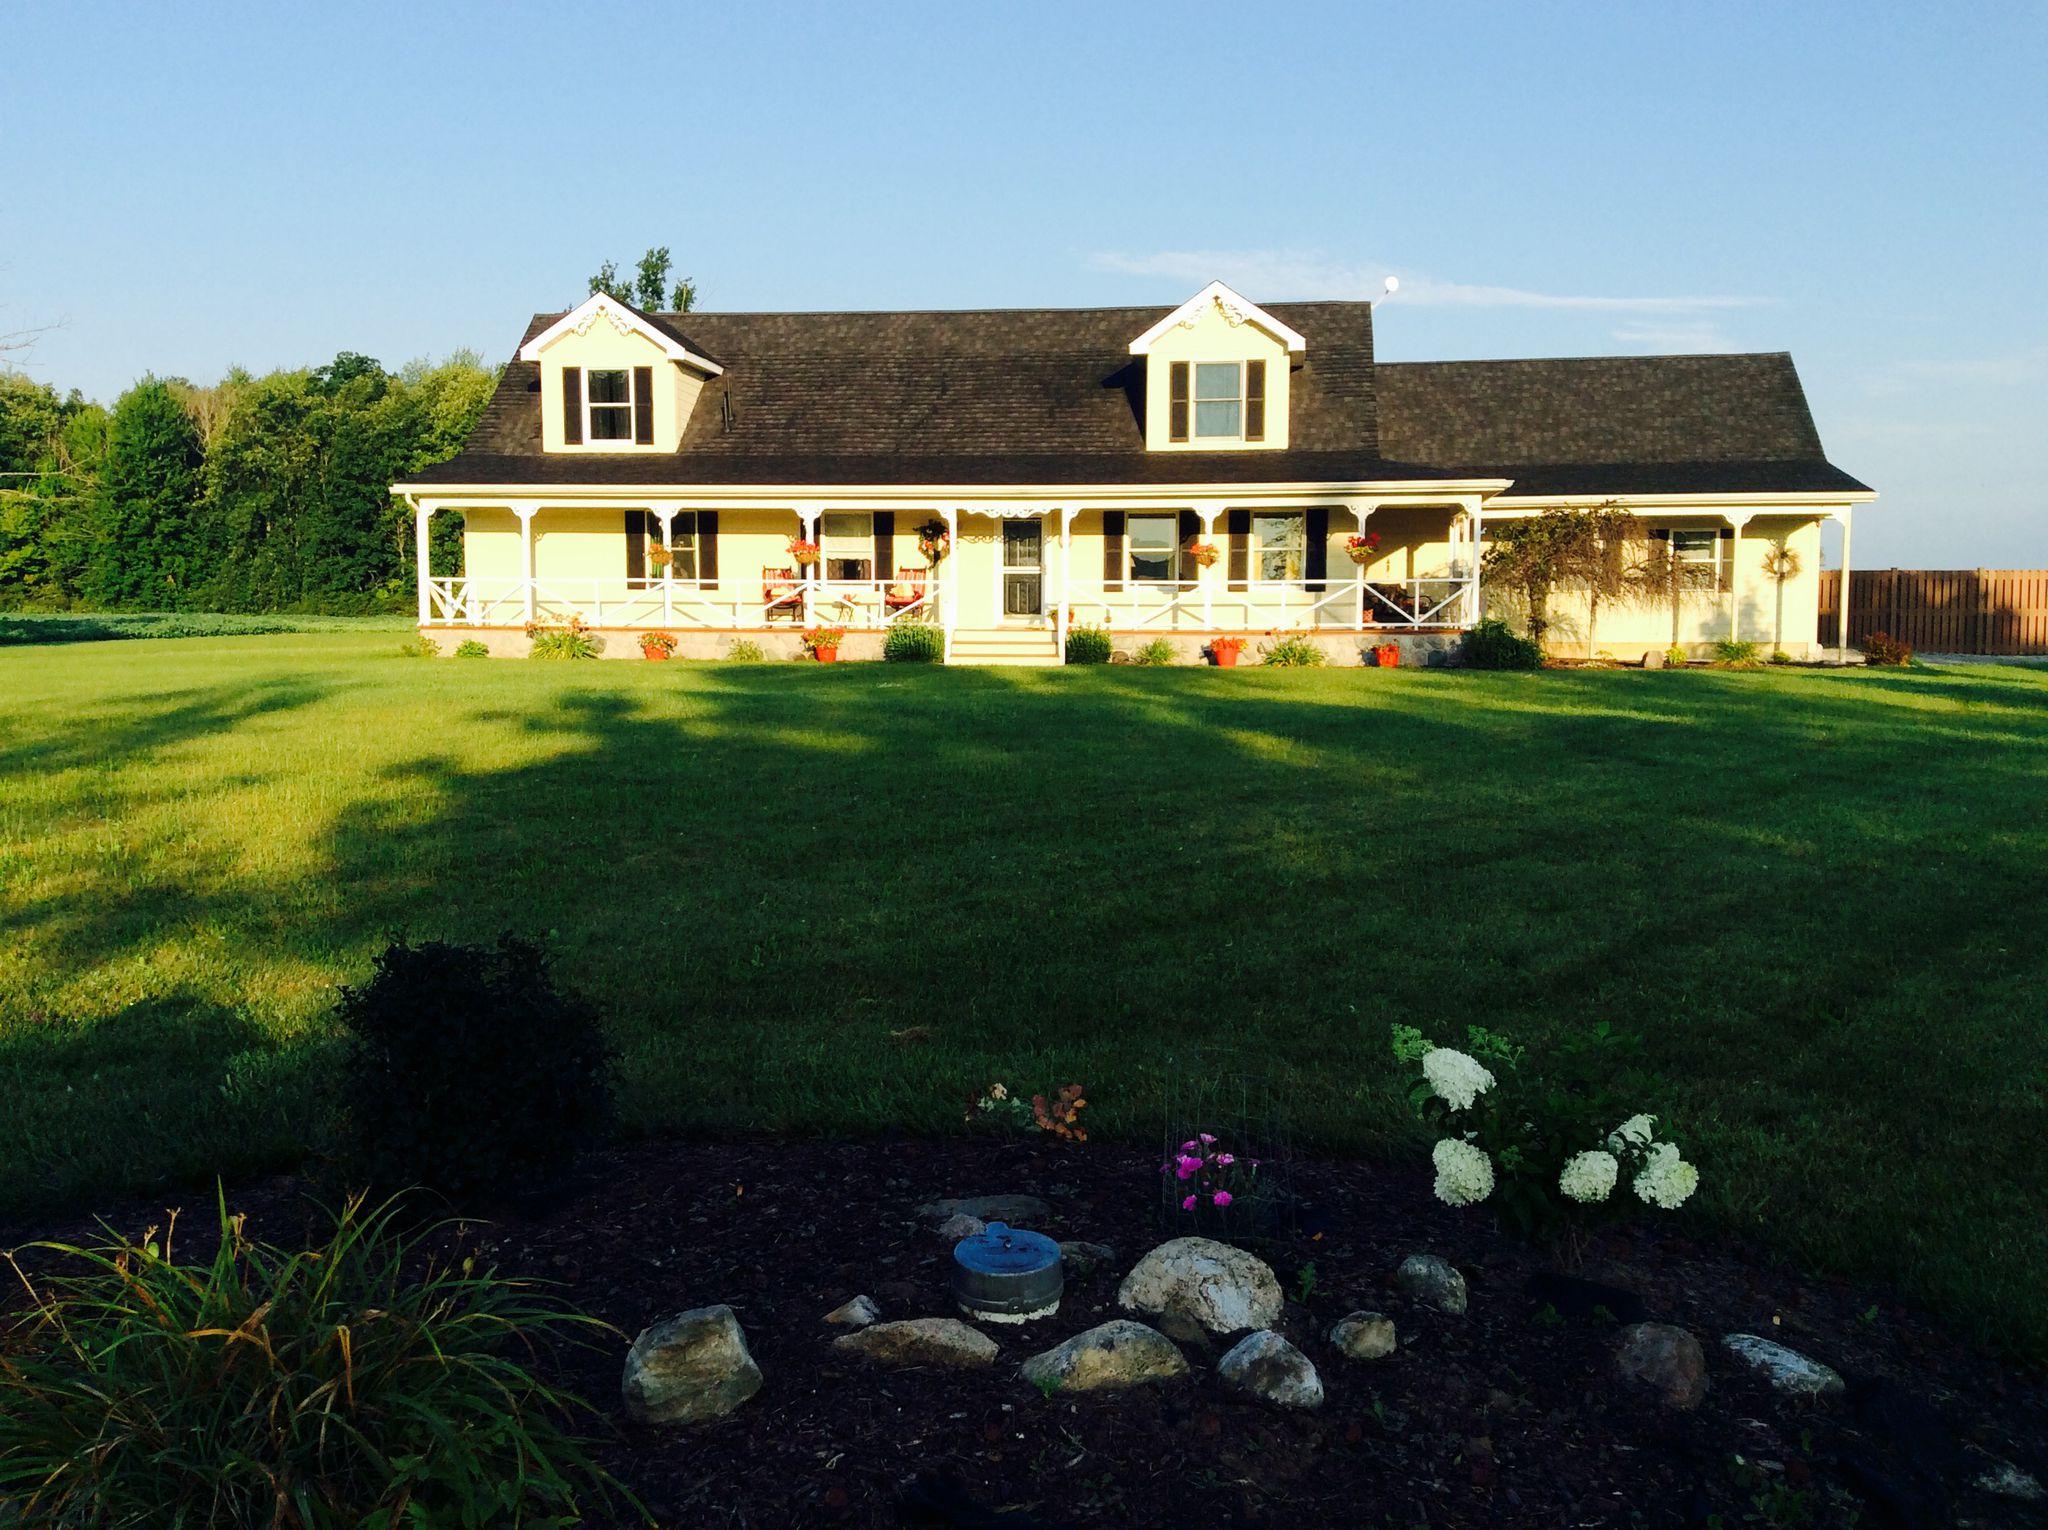 Ohio henry county ridgeville corners - T513 County Road 15b